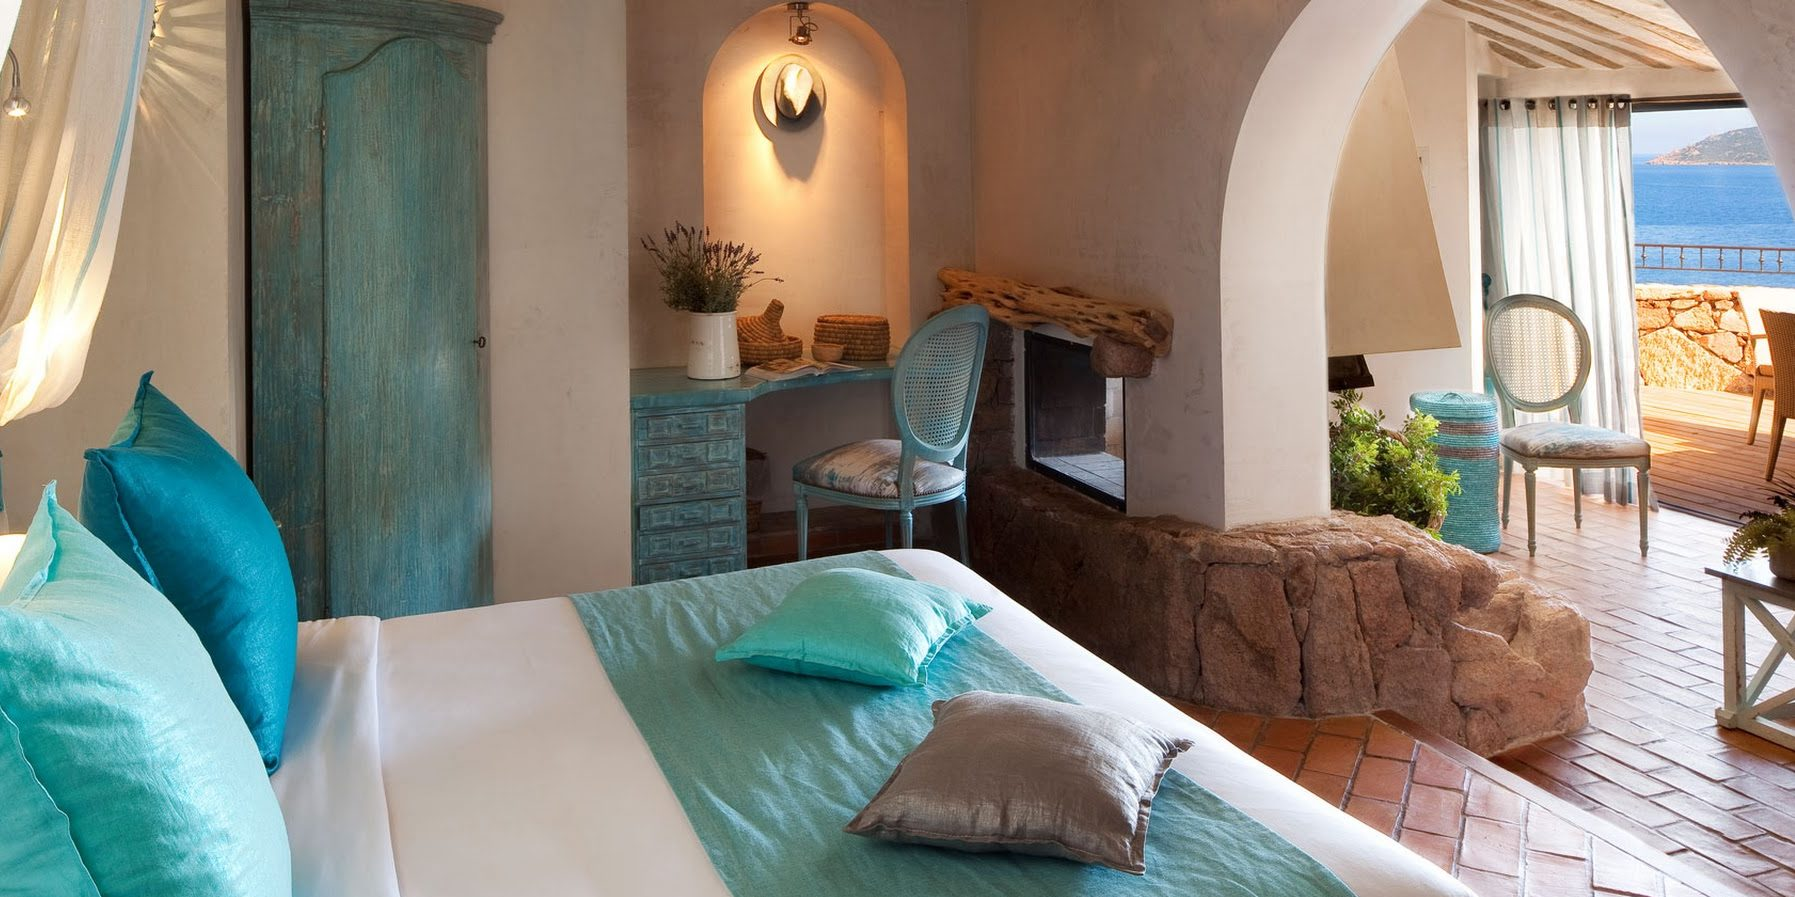 U Capu Biancu Bonifacio Corsica Frankrijk hotel kamer tweepersoonsbed terras balkon zeezicht